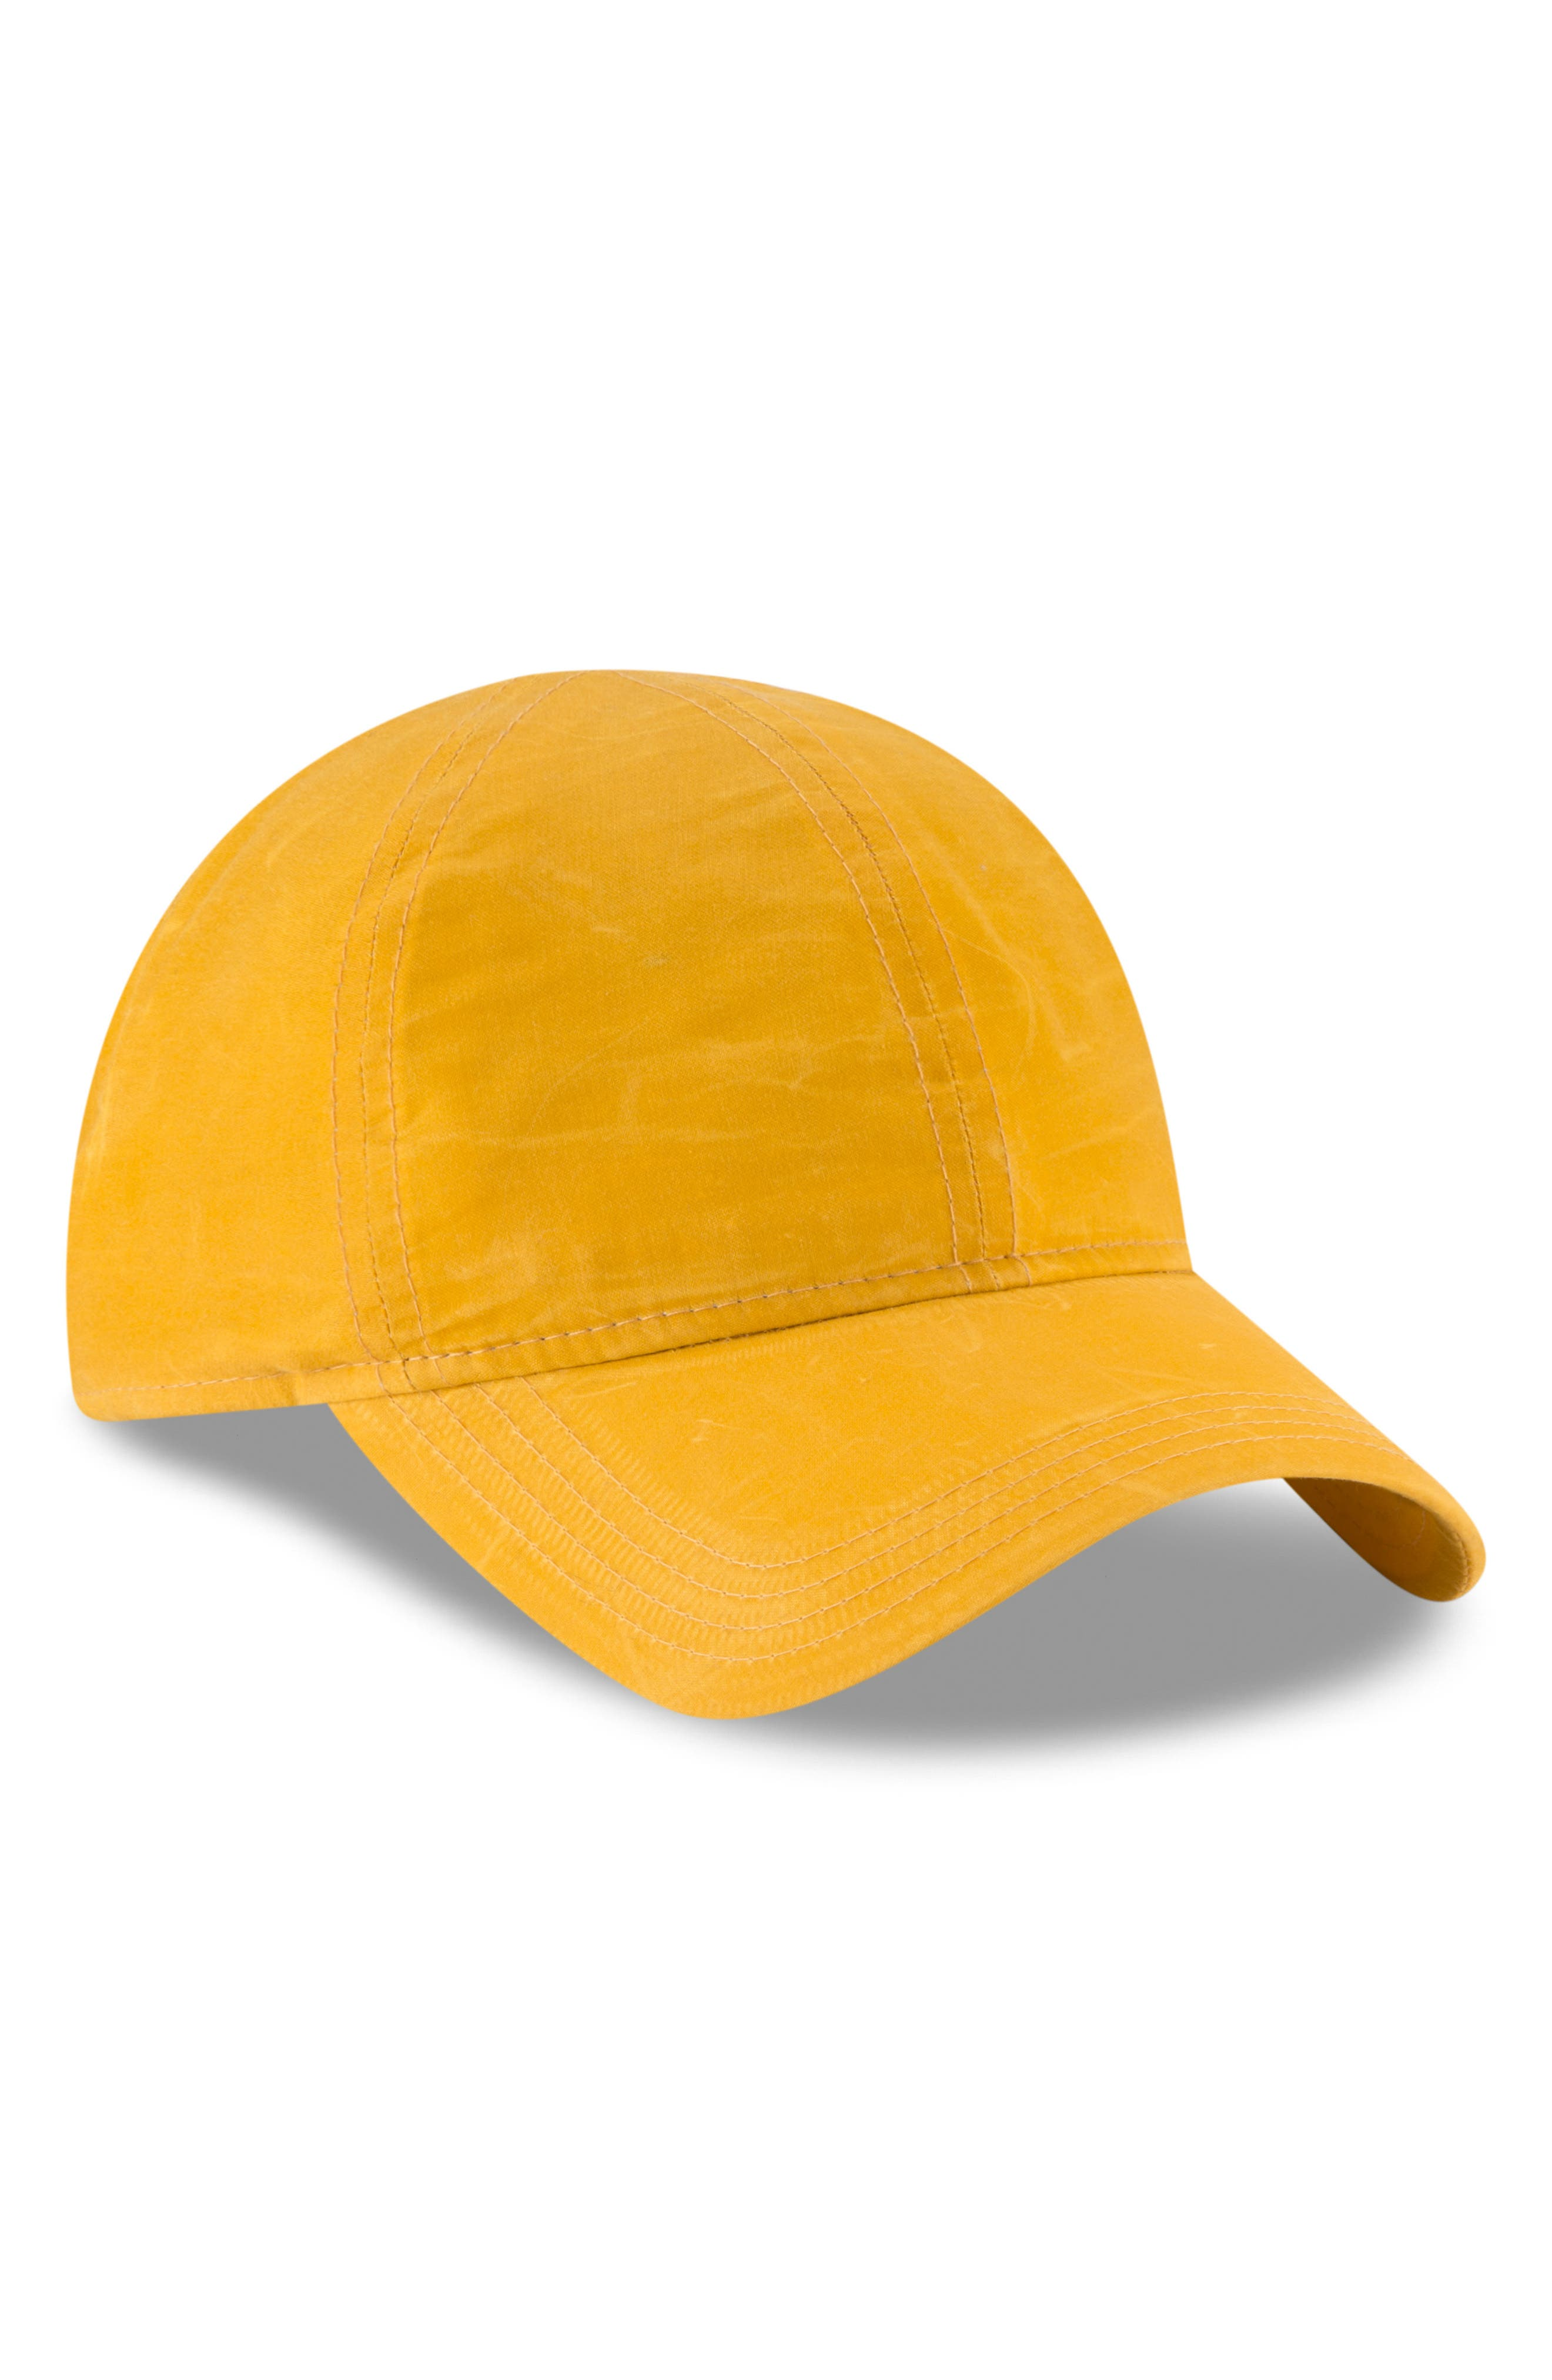 Moleskin 9Twenty Cap,                             Alternate thumbnail 5, color,                             GOLD